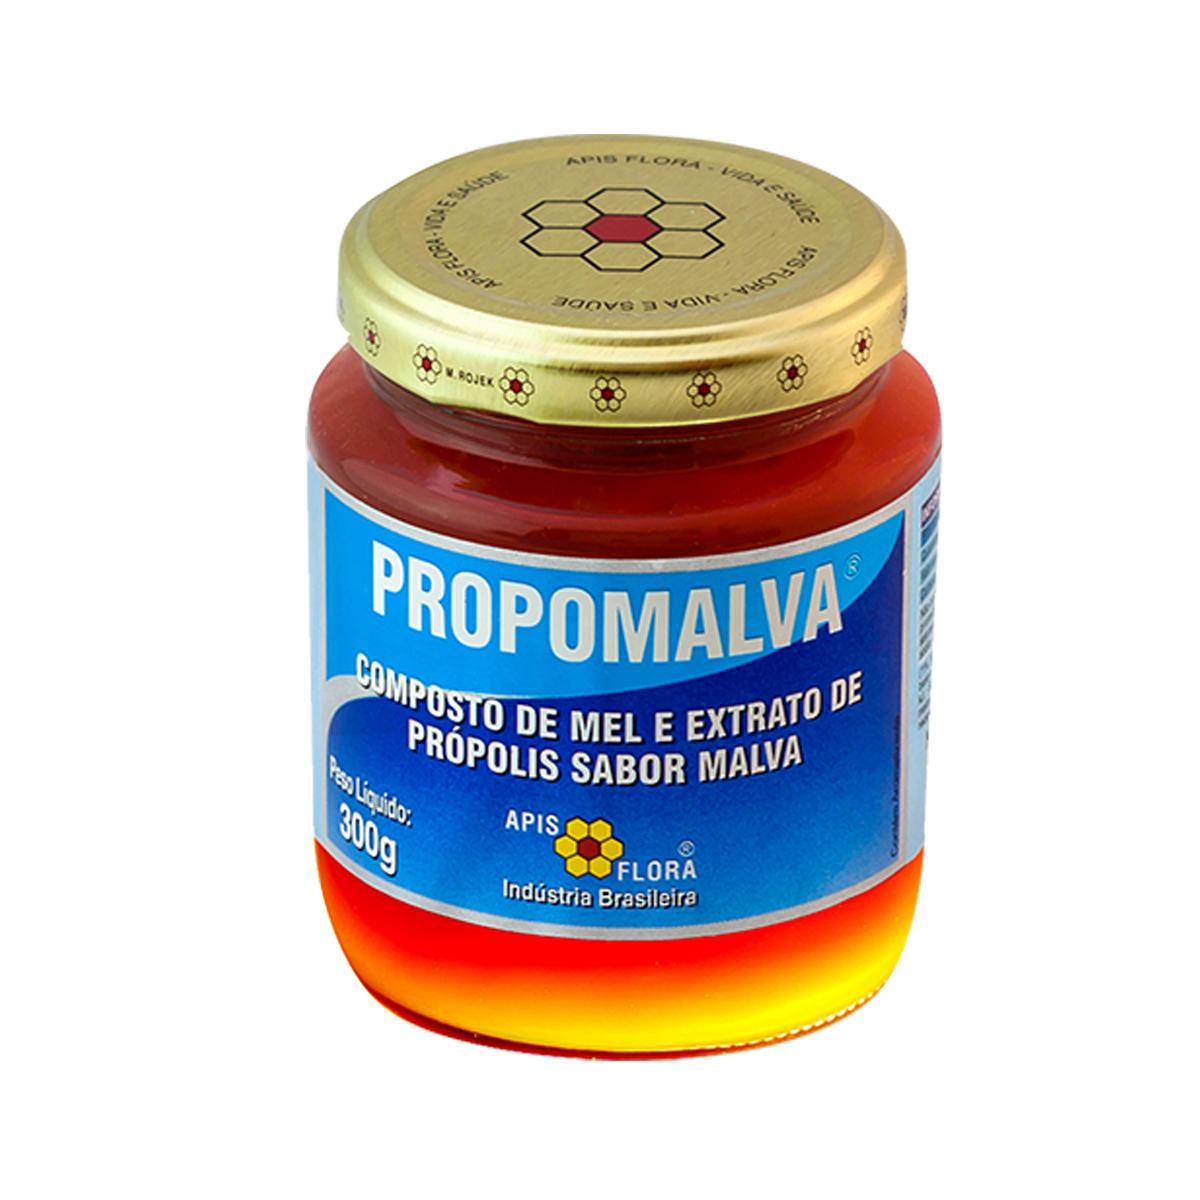 Composto de Mel e Extrato de Própolis Propomalva  300g - Apis Flora